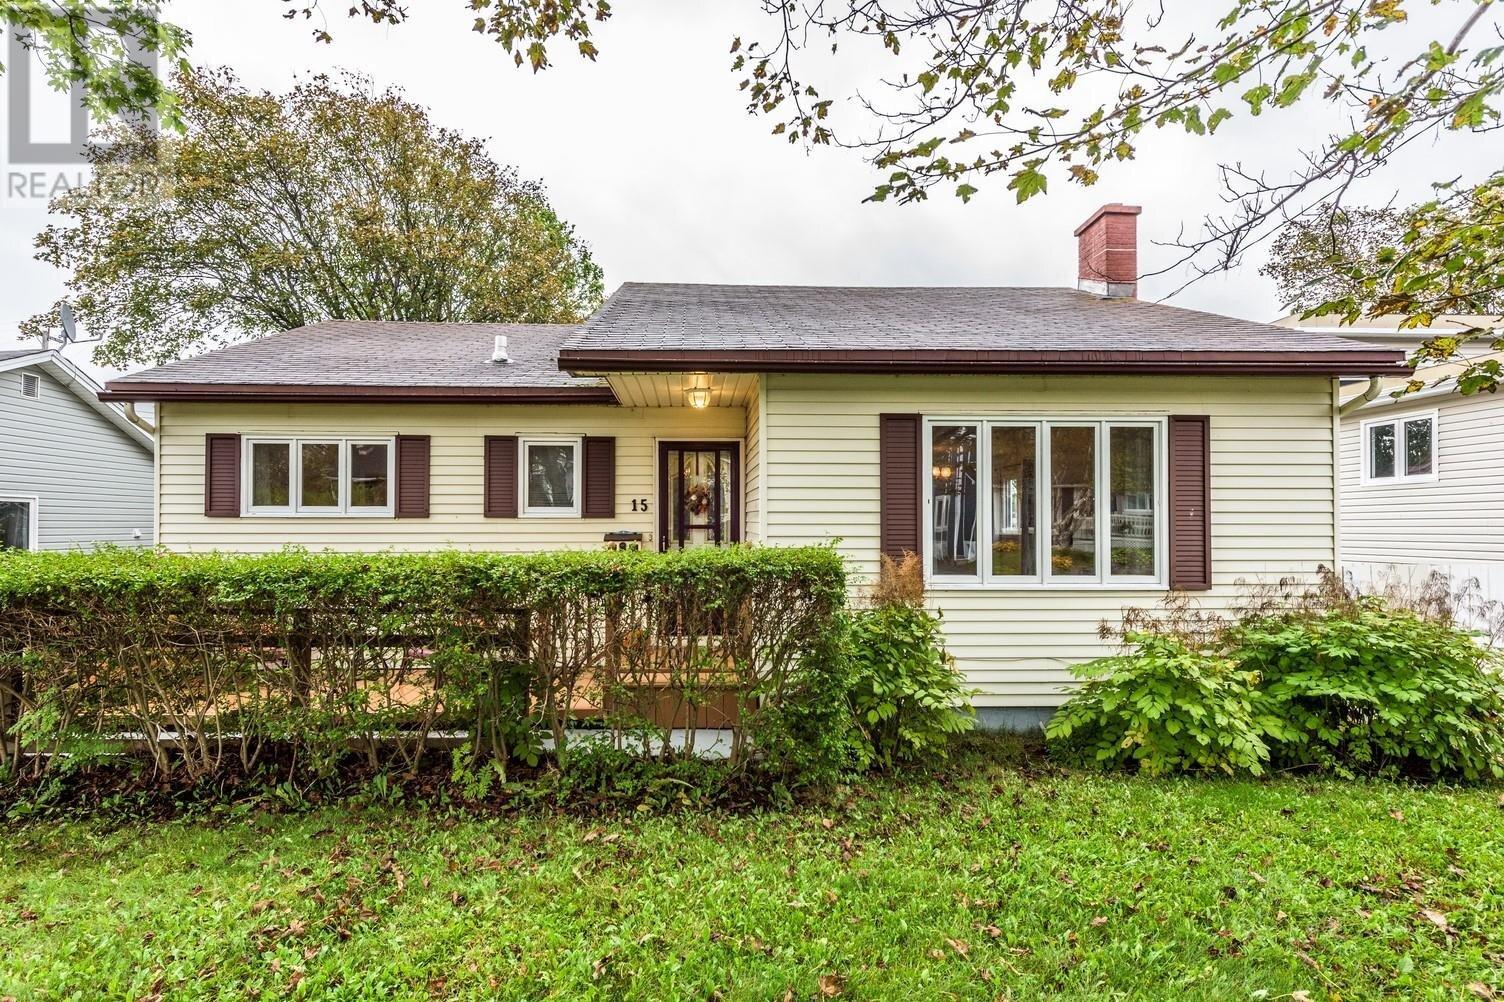 House for sale at 15 Horwood St St. John's Newfoundland - MLS: 1222720